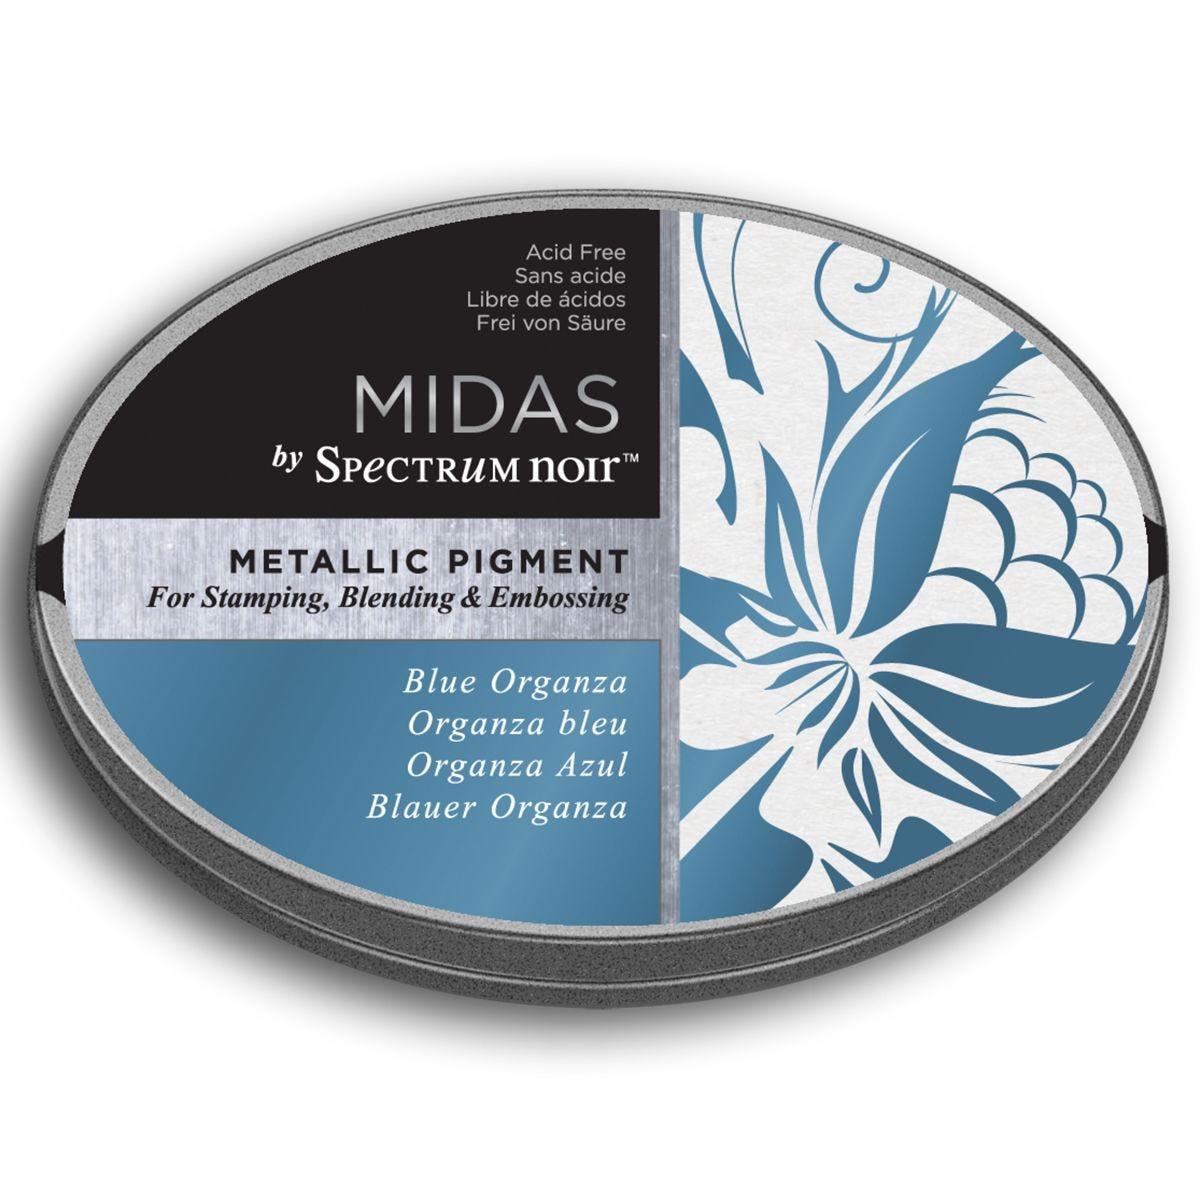 Midas by Spectrum Noir Metallic Pigment Inkpad - Blue Organza